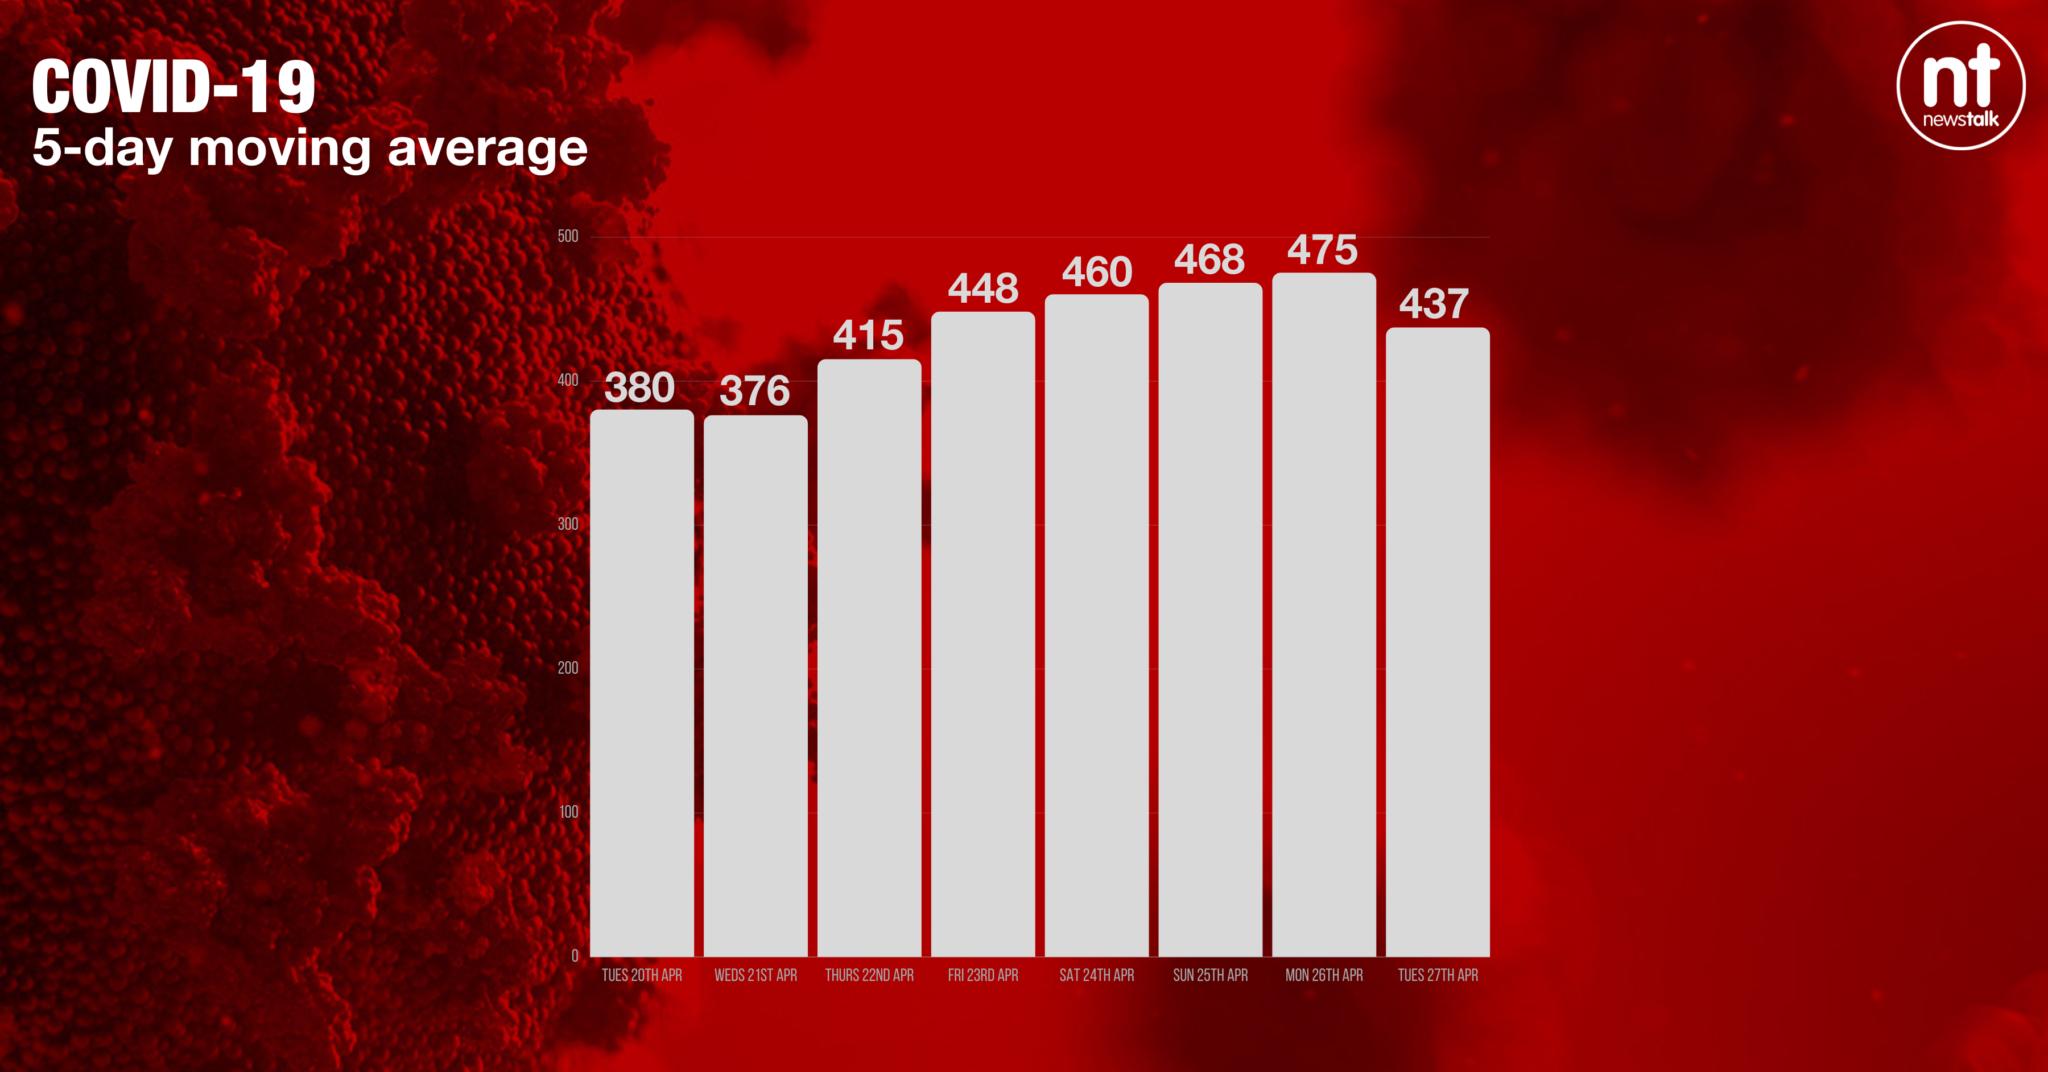 The coronavirus Five-day moving average